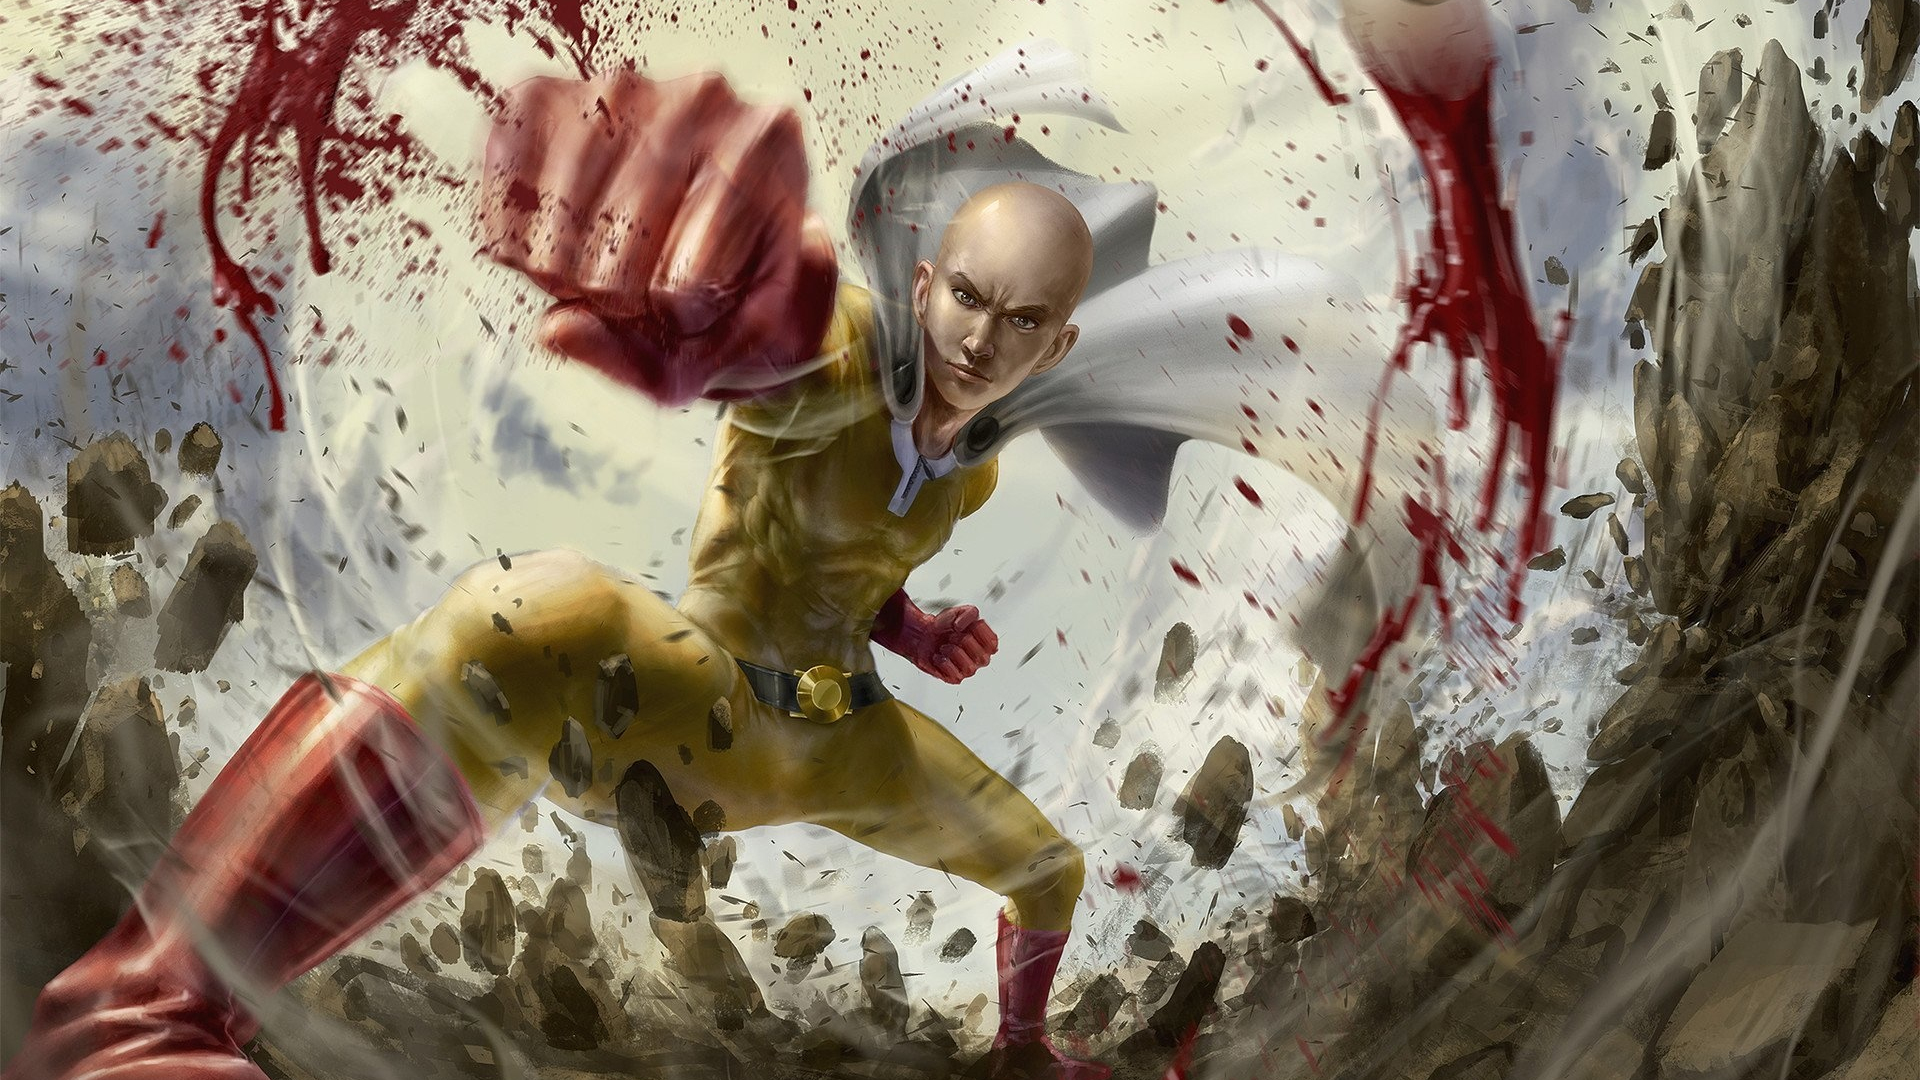 Download 1920x1080 Wallpaper Saitama One Punch Man Anime Boy